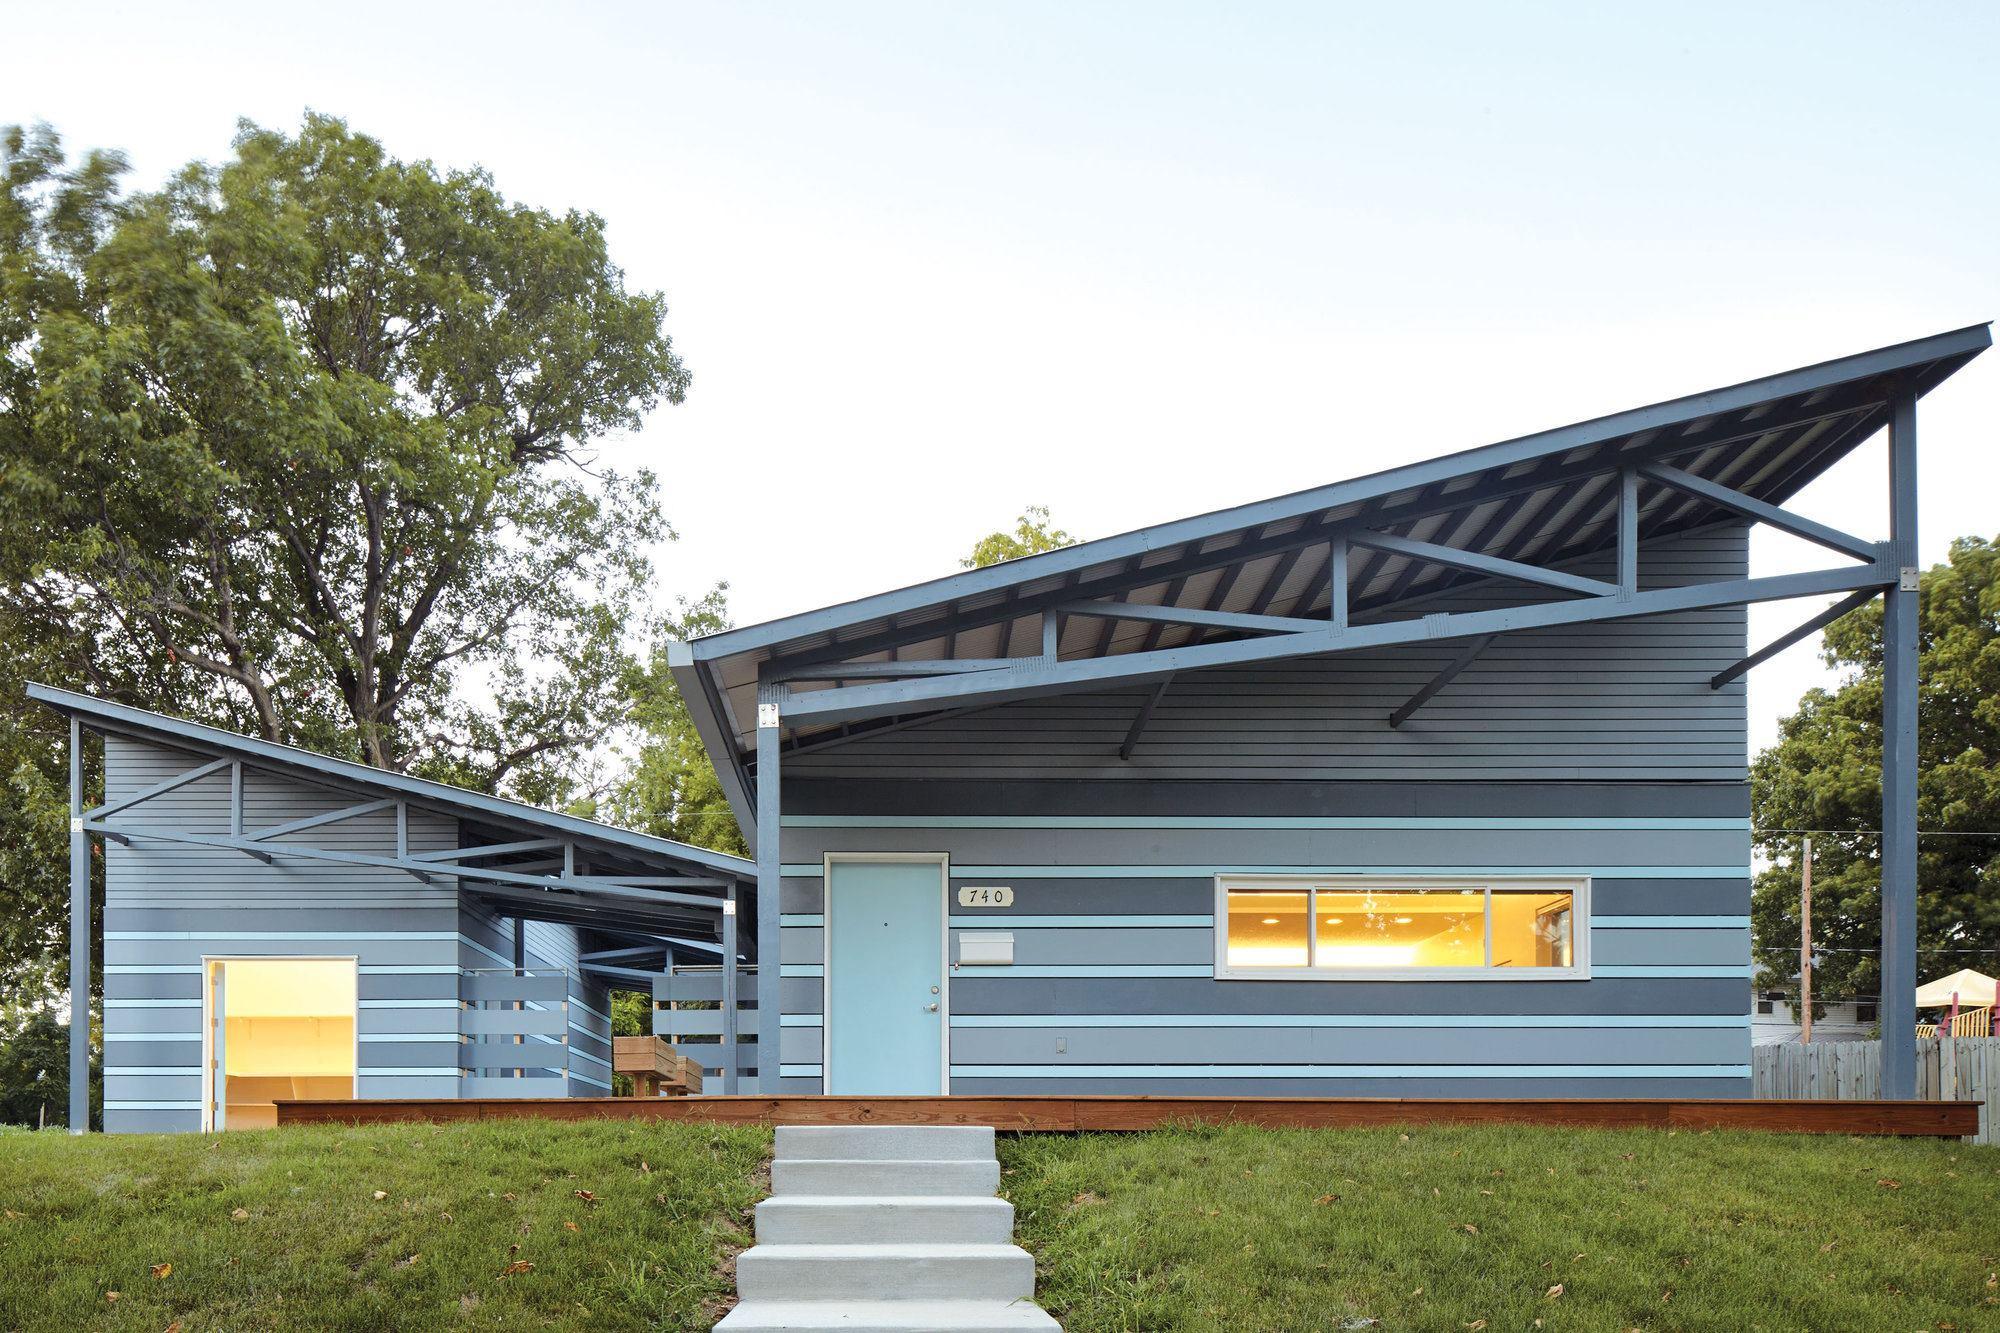 Habitat for humanity prototype designed by el dorado for Modern home design kansas city